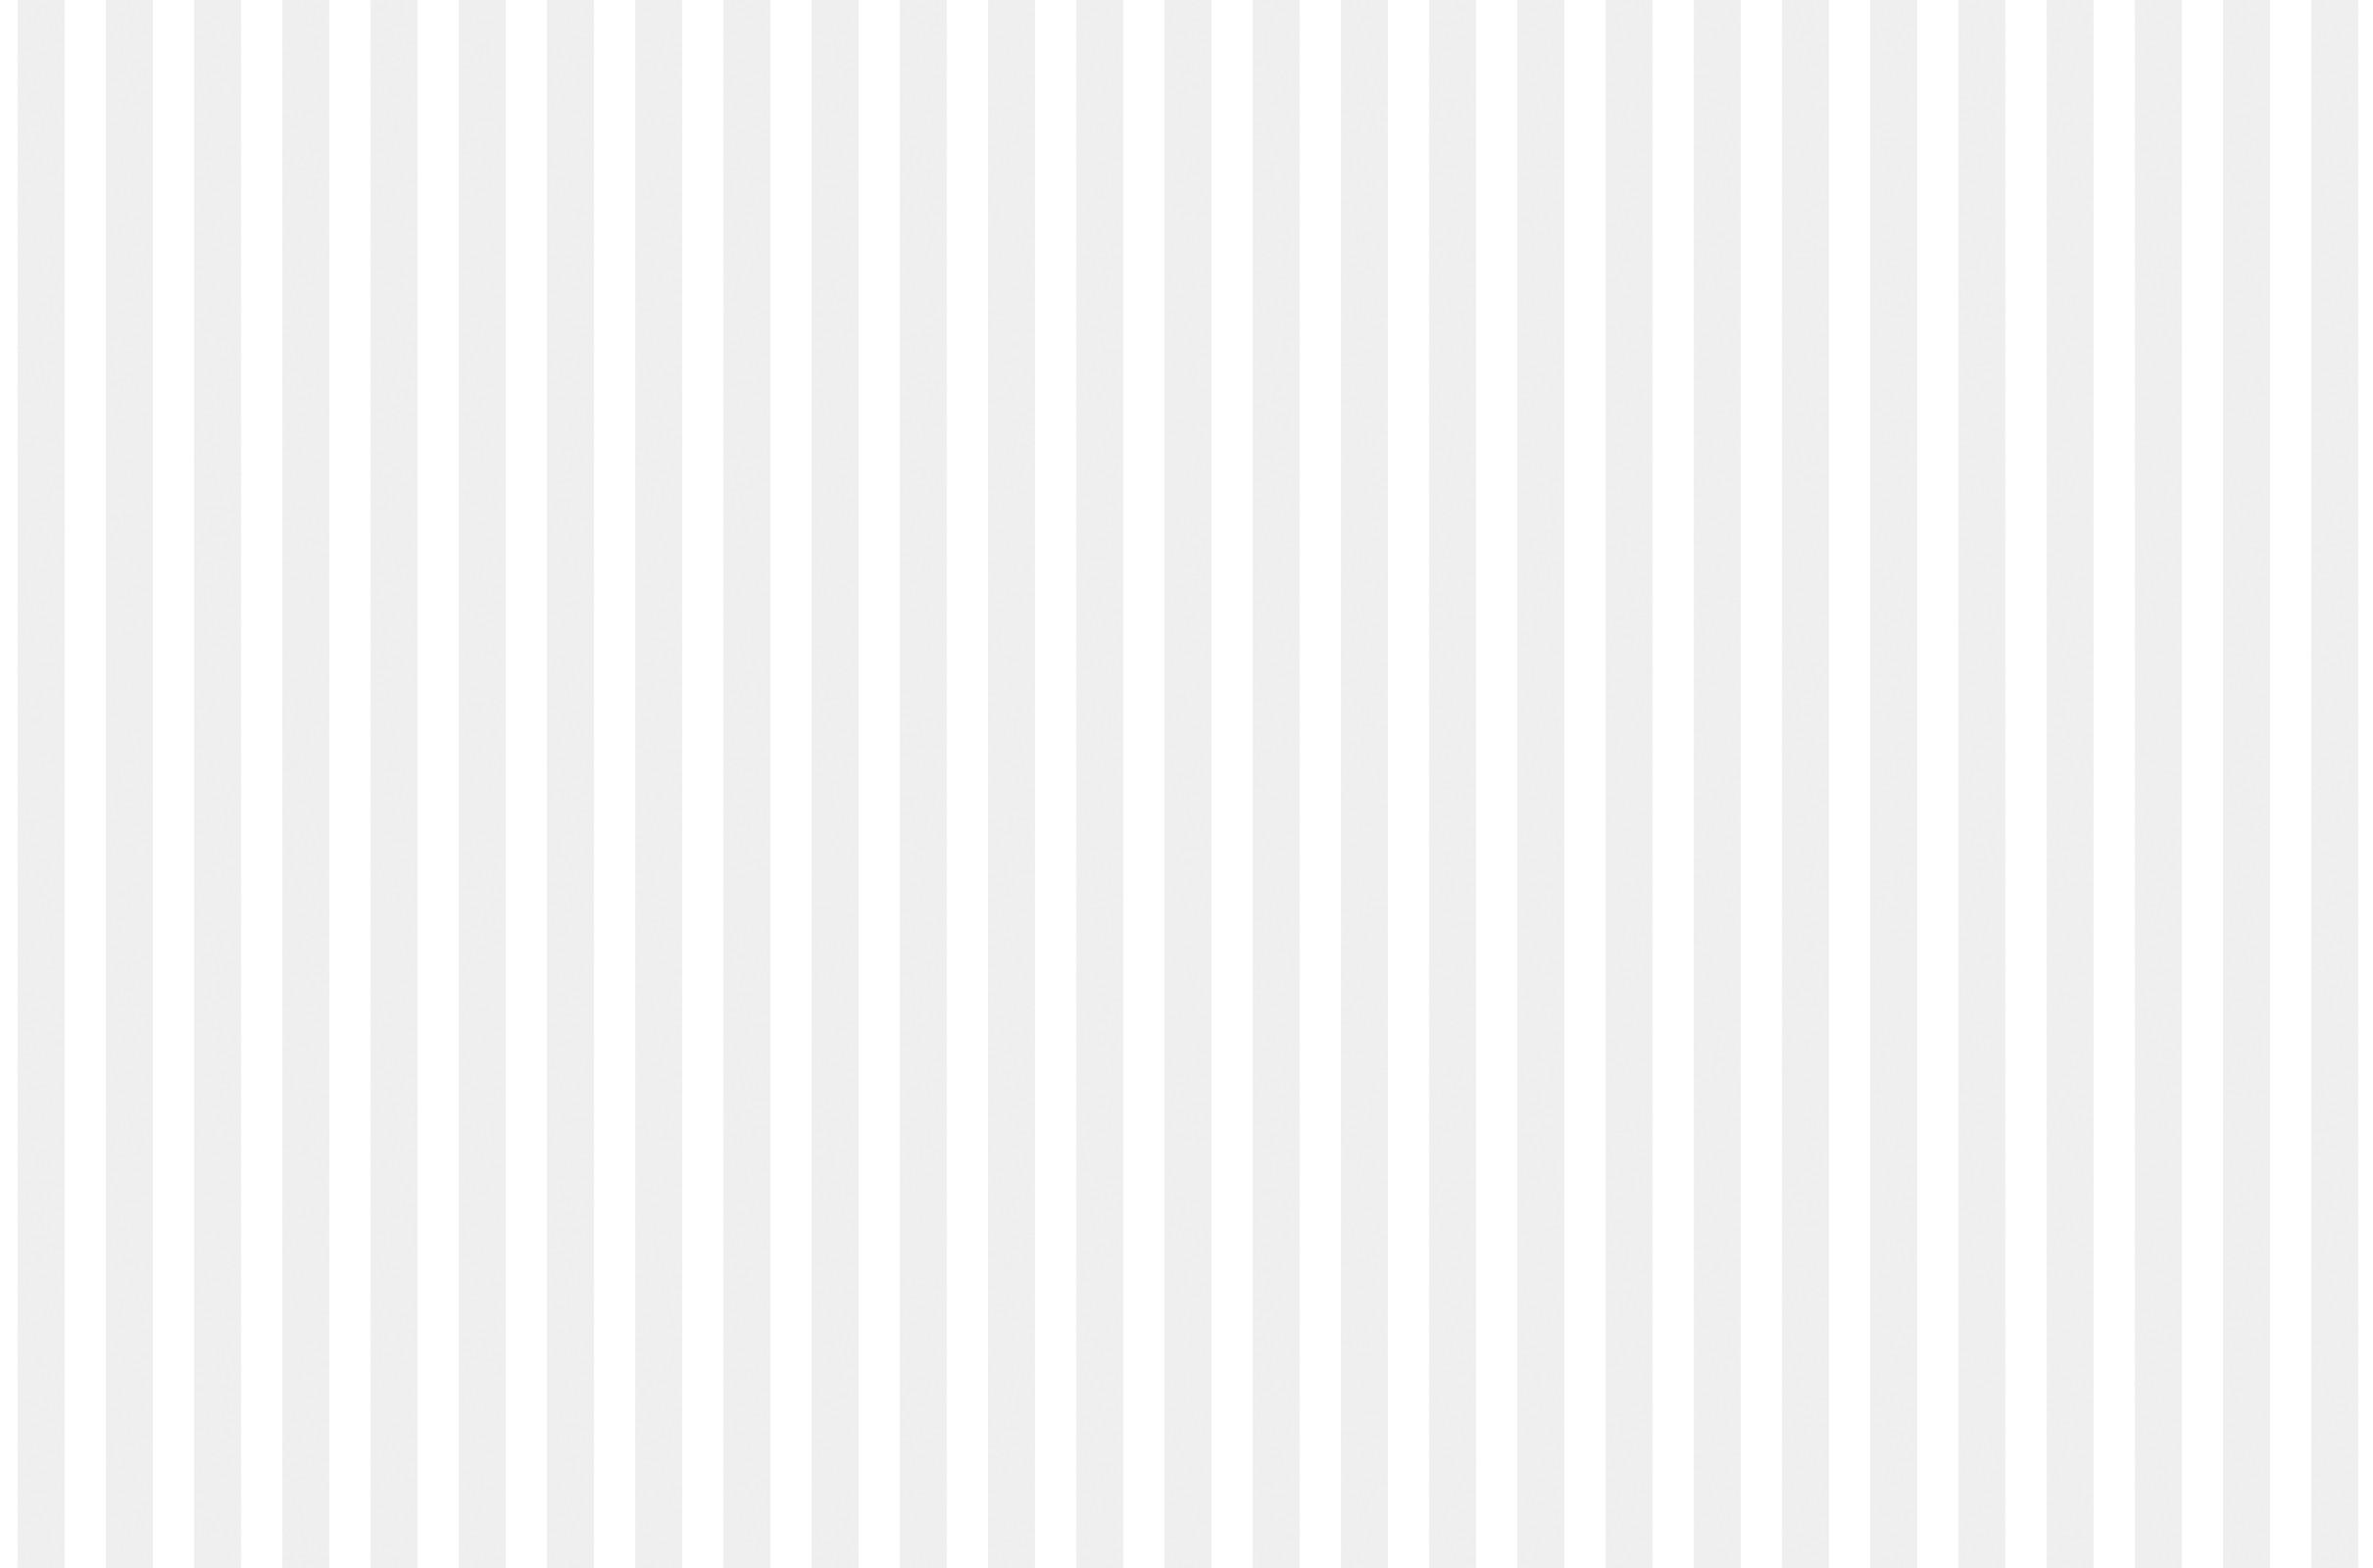 Background Patterns Download Free Beautiful Full Hd